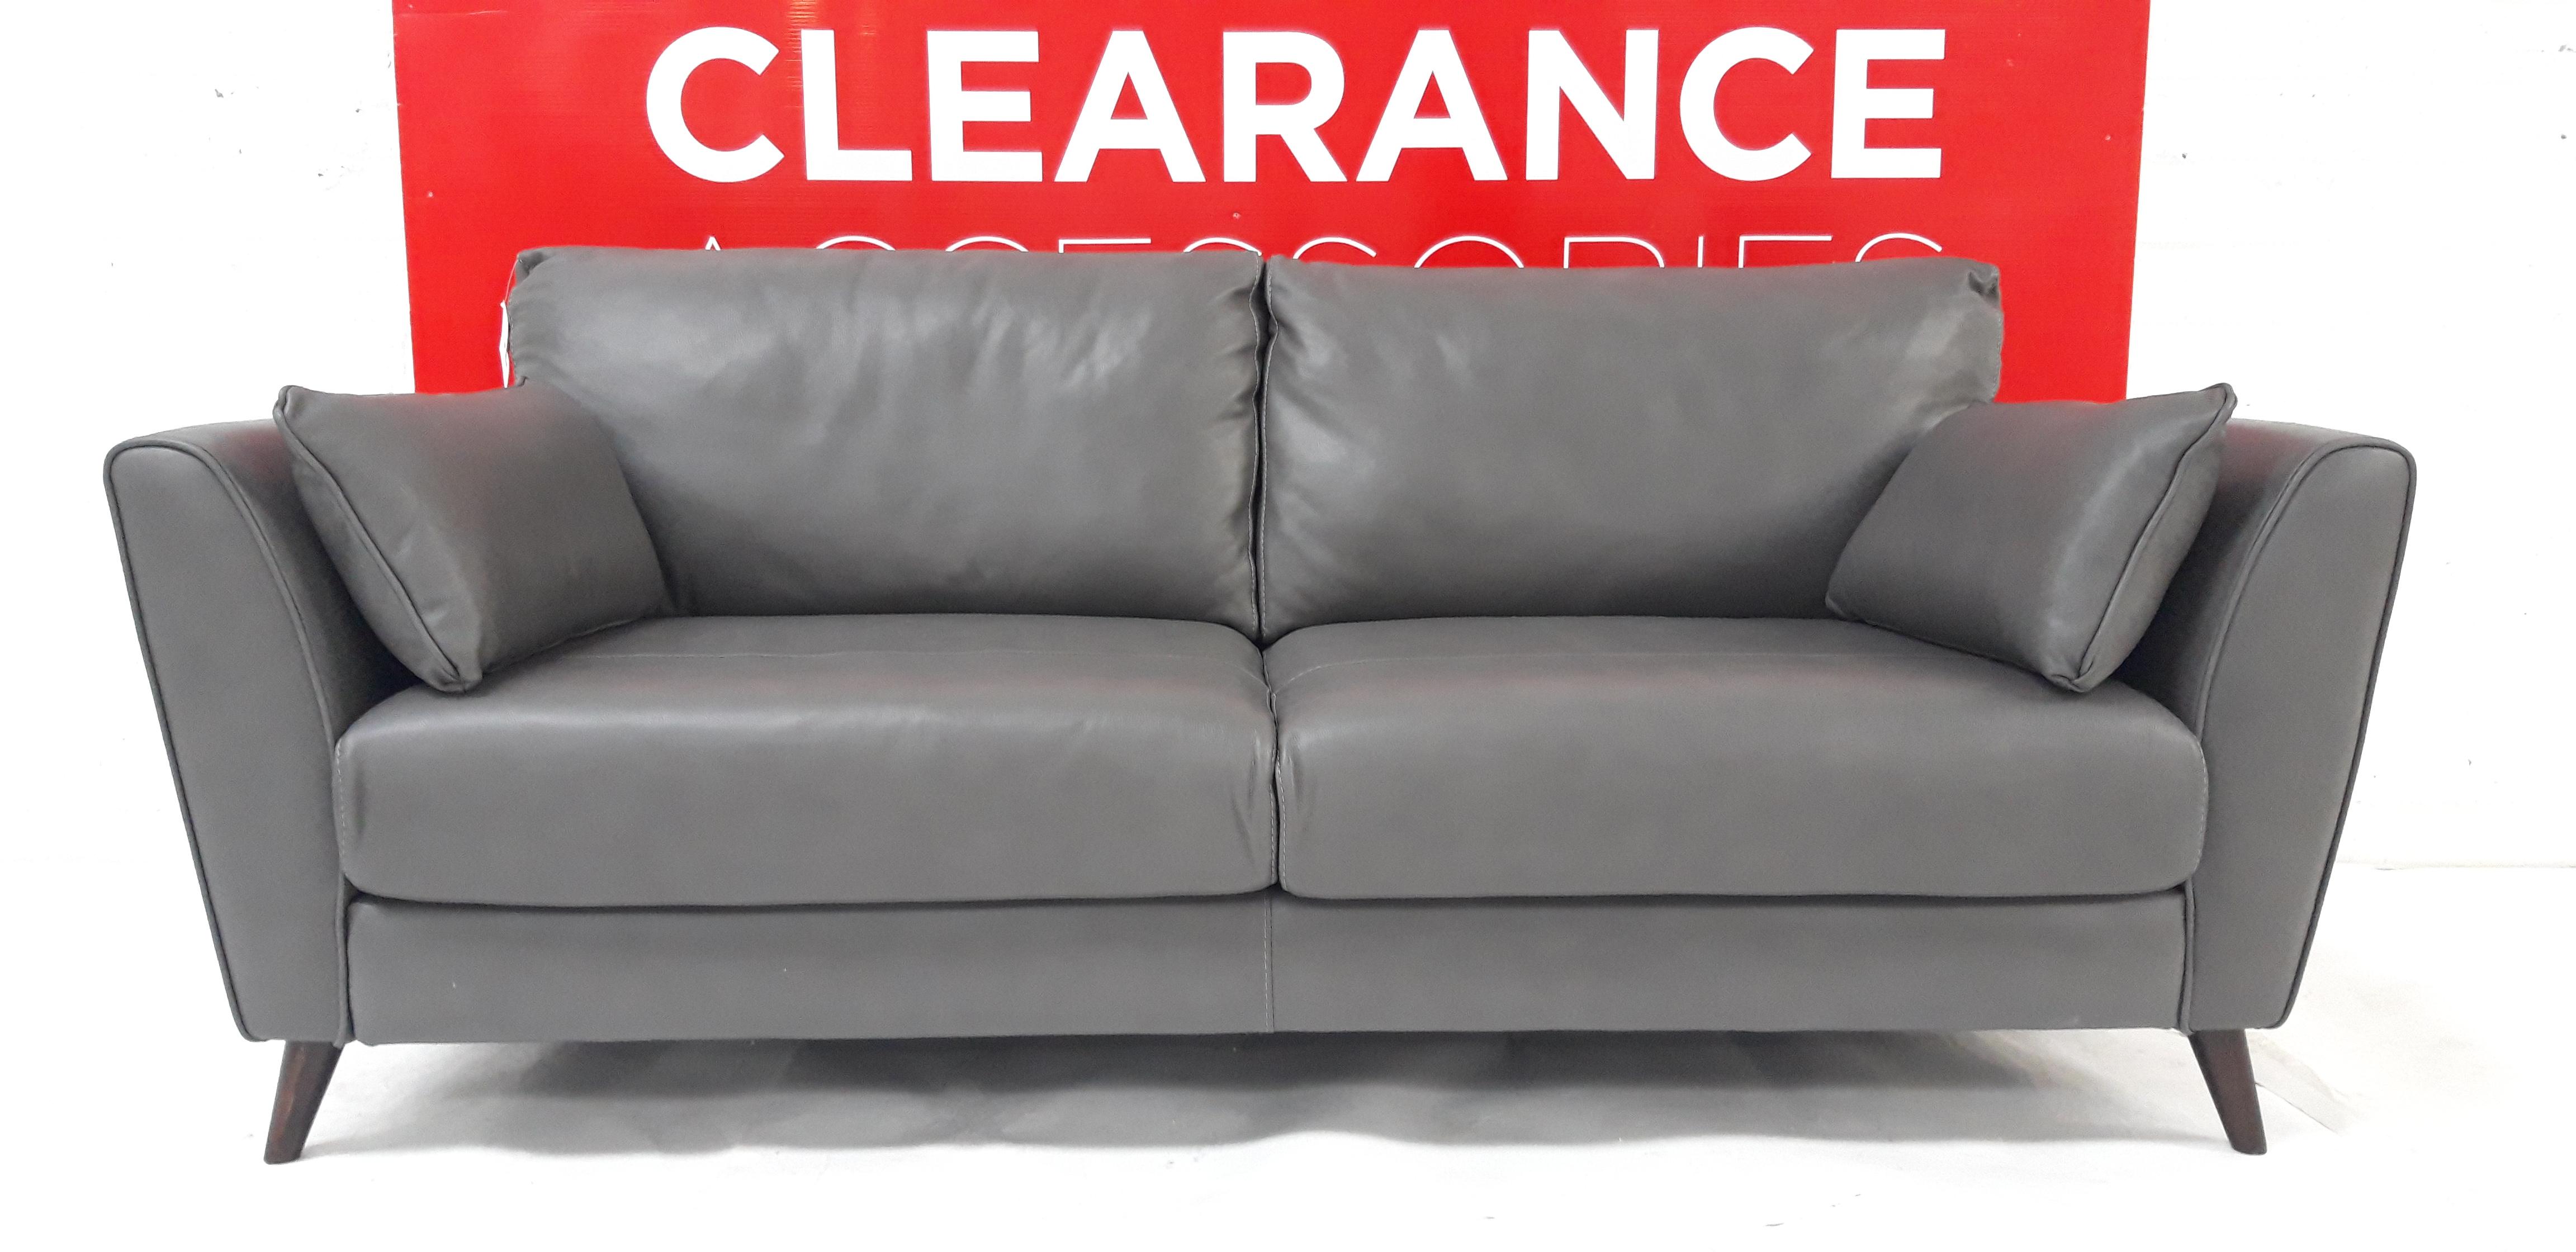 Bellagio Large Plain Sofa - OUTLET